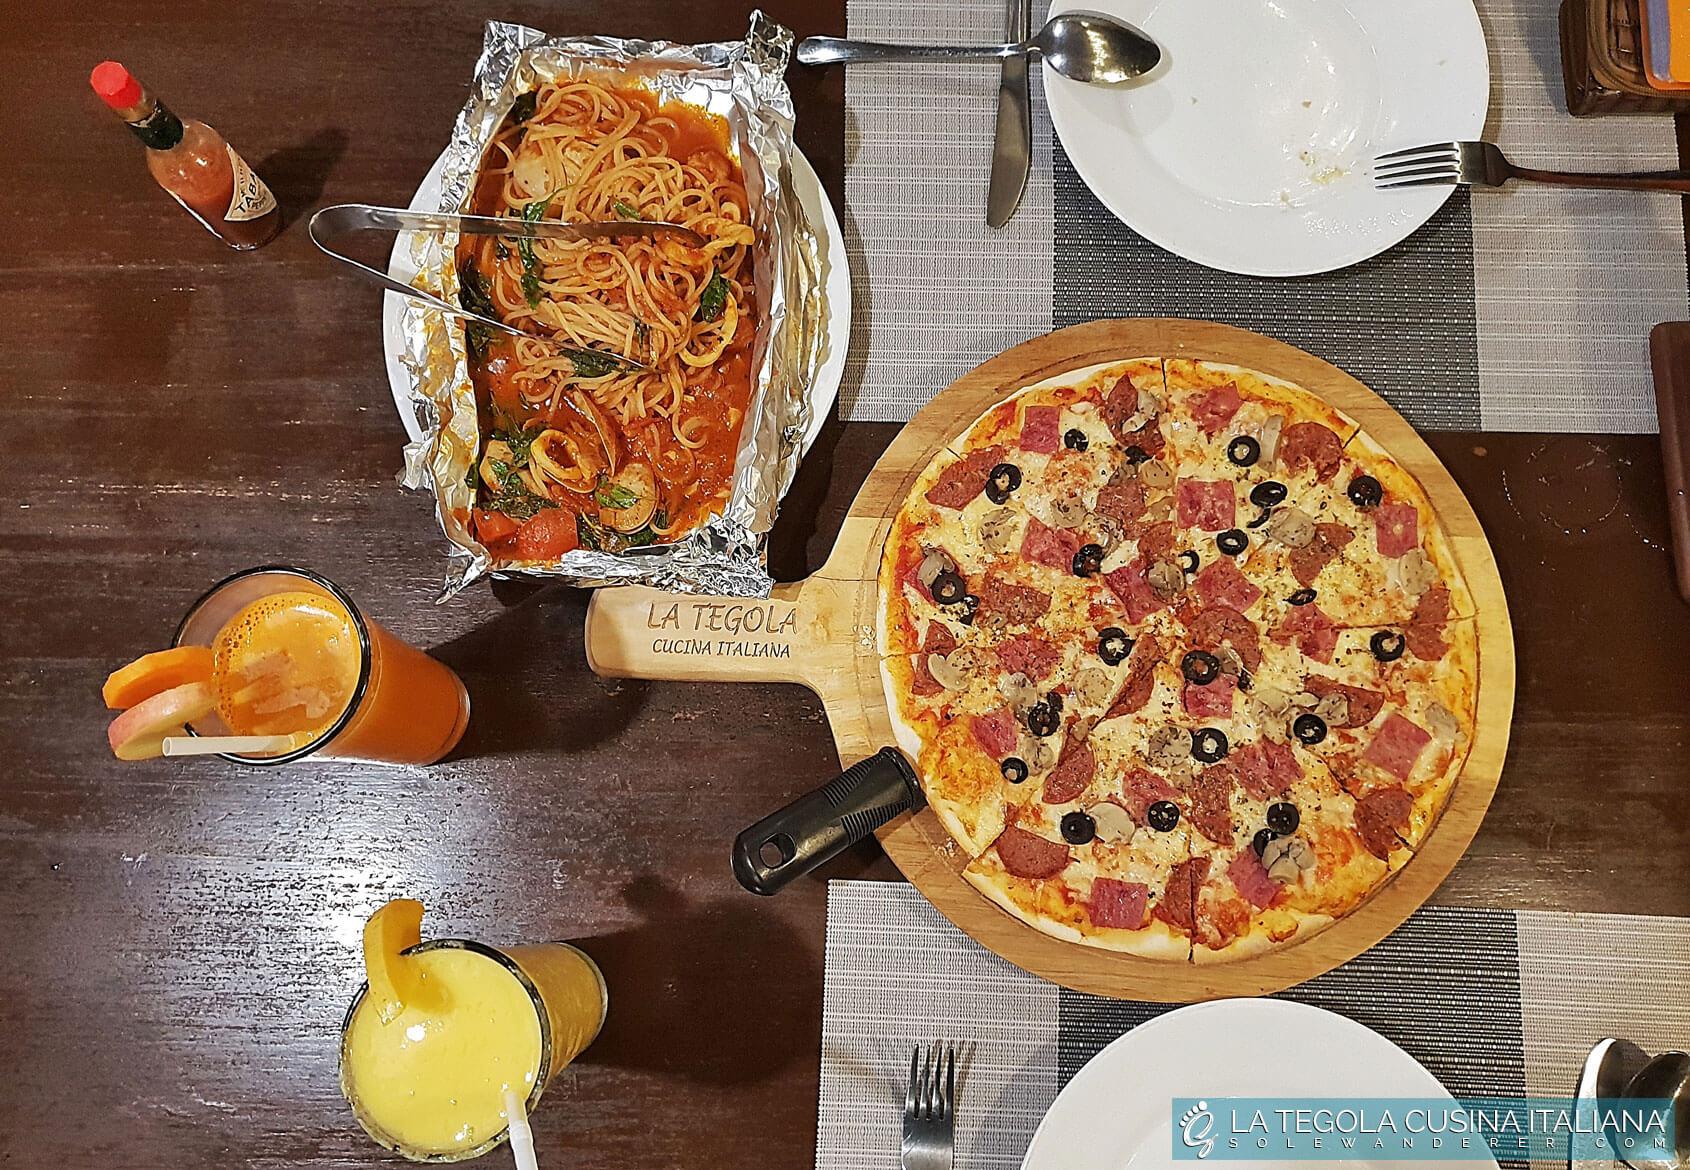 La Tegola Cucina Italiana Dining